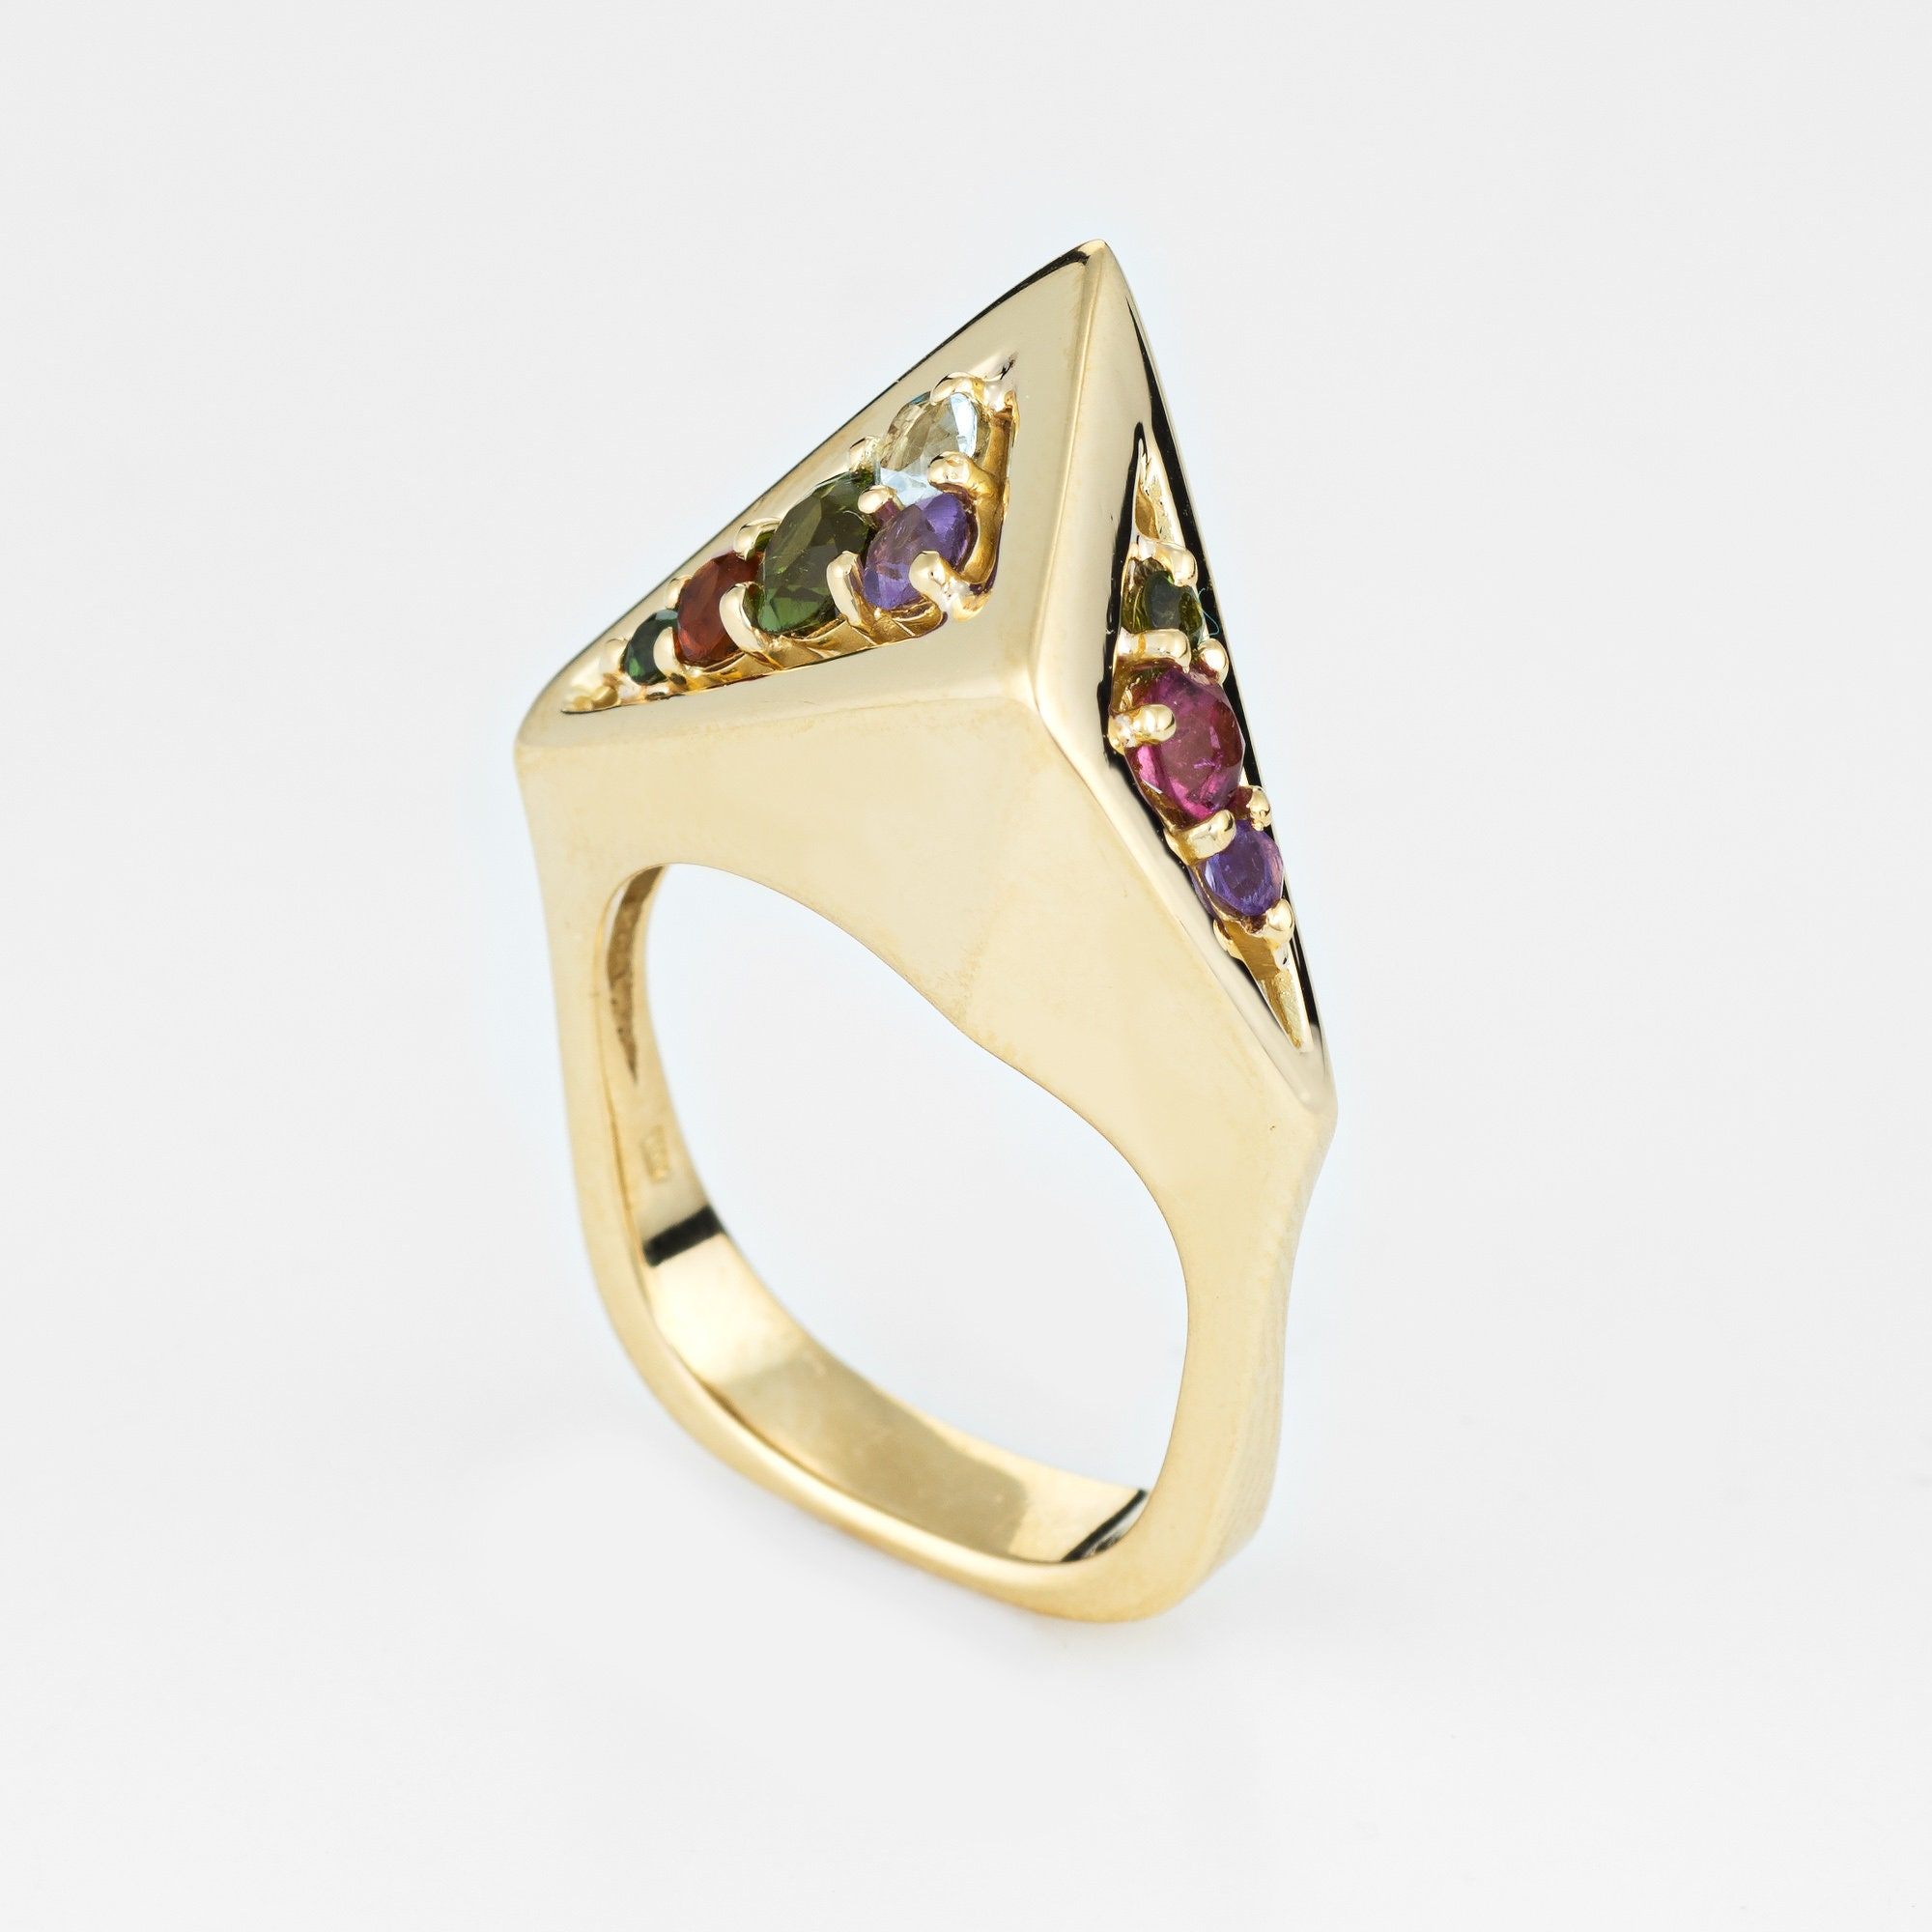 Vintage H Stern 80s Rainbow Gemstone Ring 18k Yellow Gold Geometric Jewelry Sz 6, used for sale